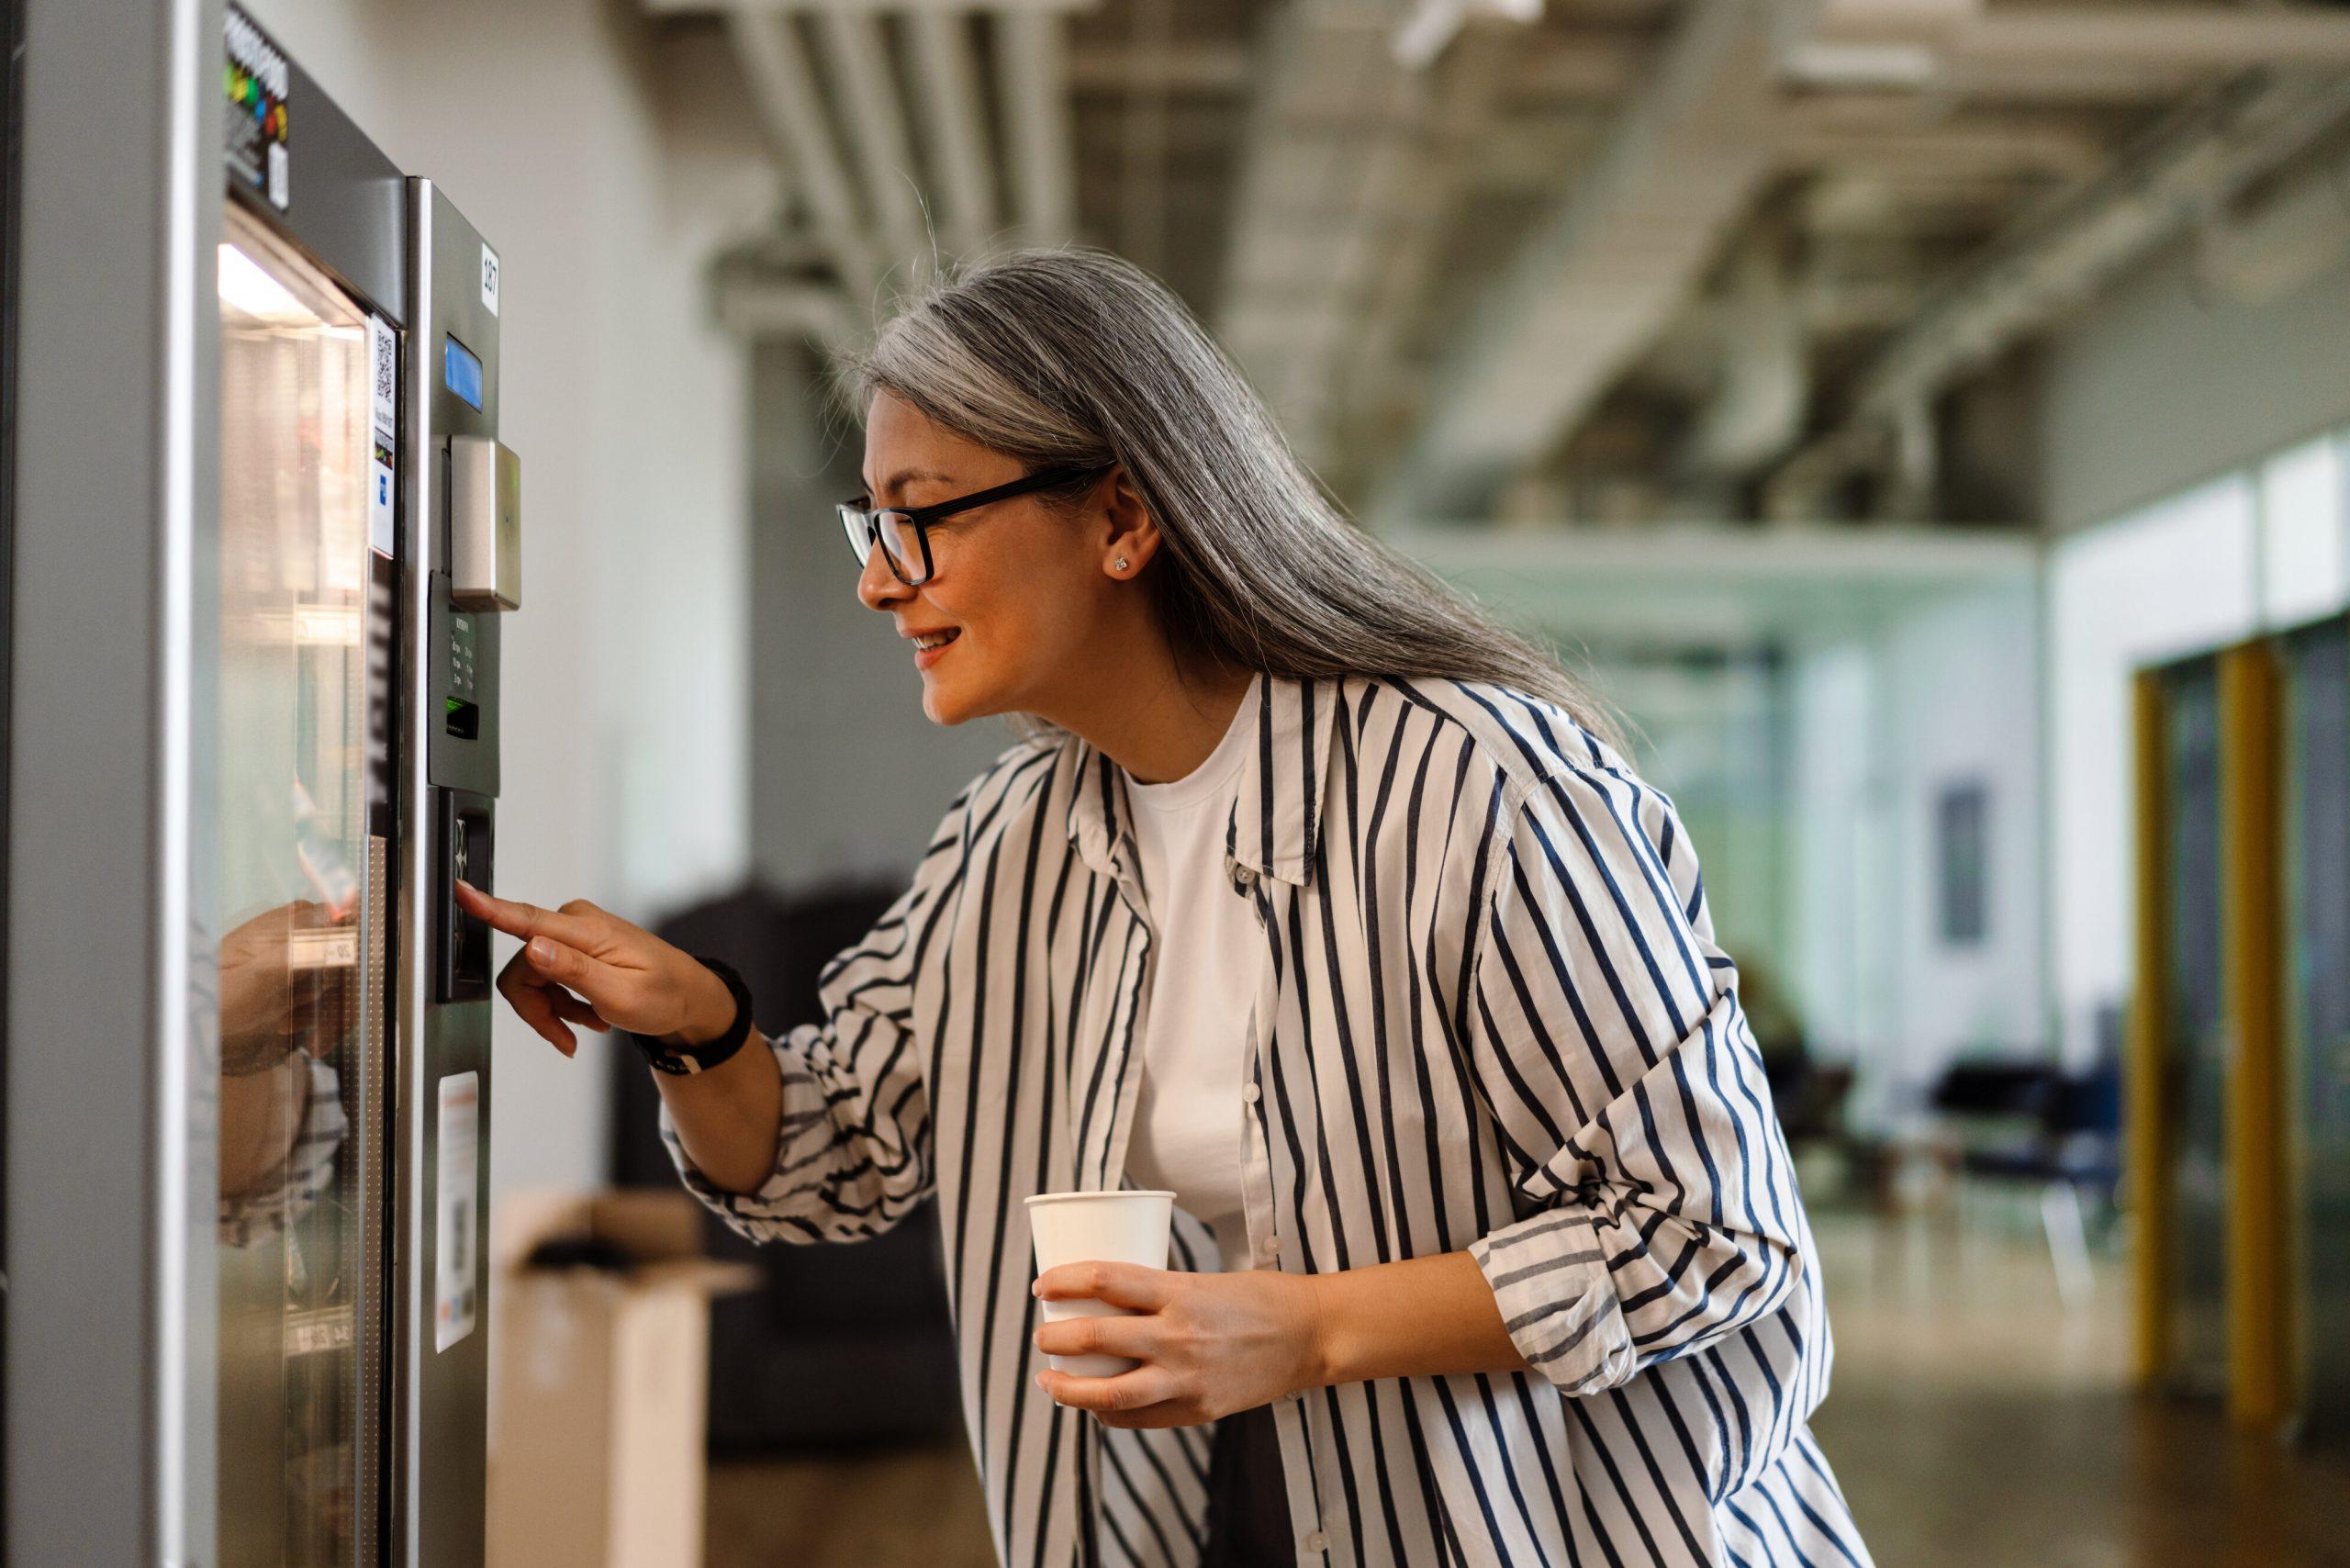 healthy vending machine phoenix | vending machines | vending machines in Phoenix | Phoenix vending